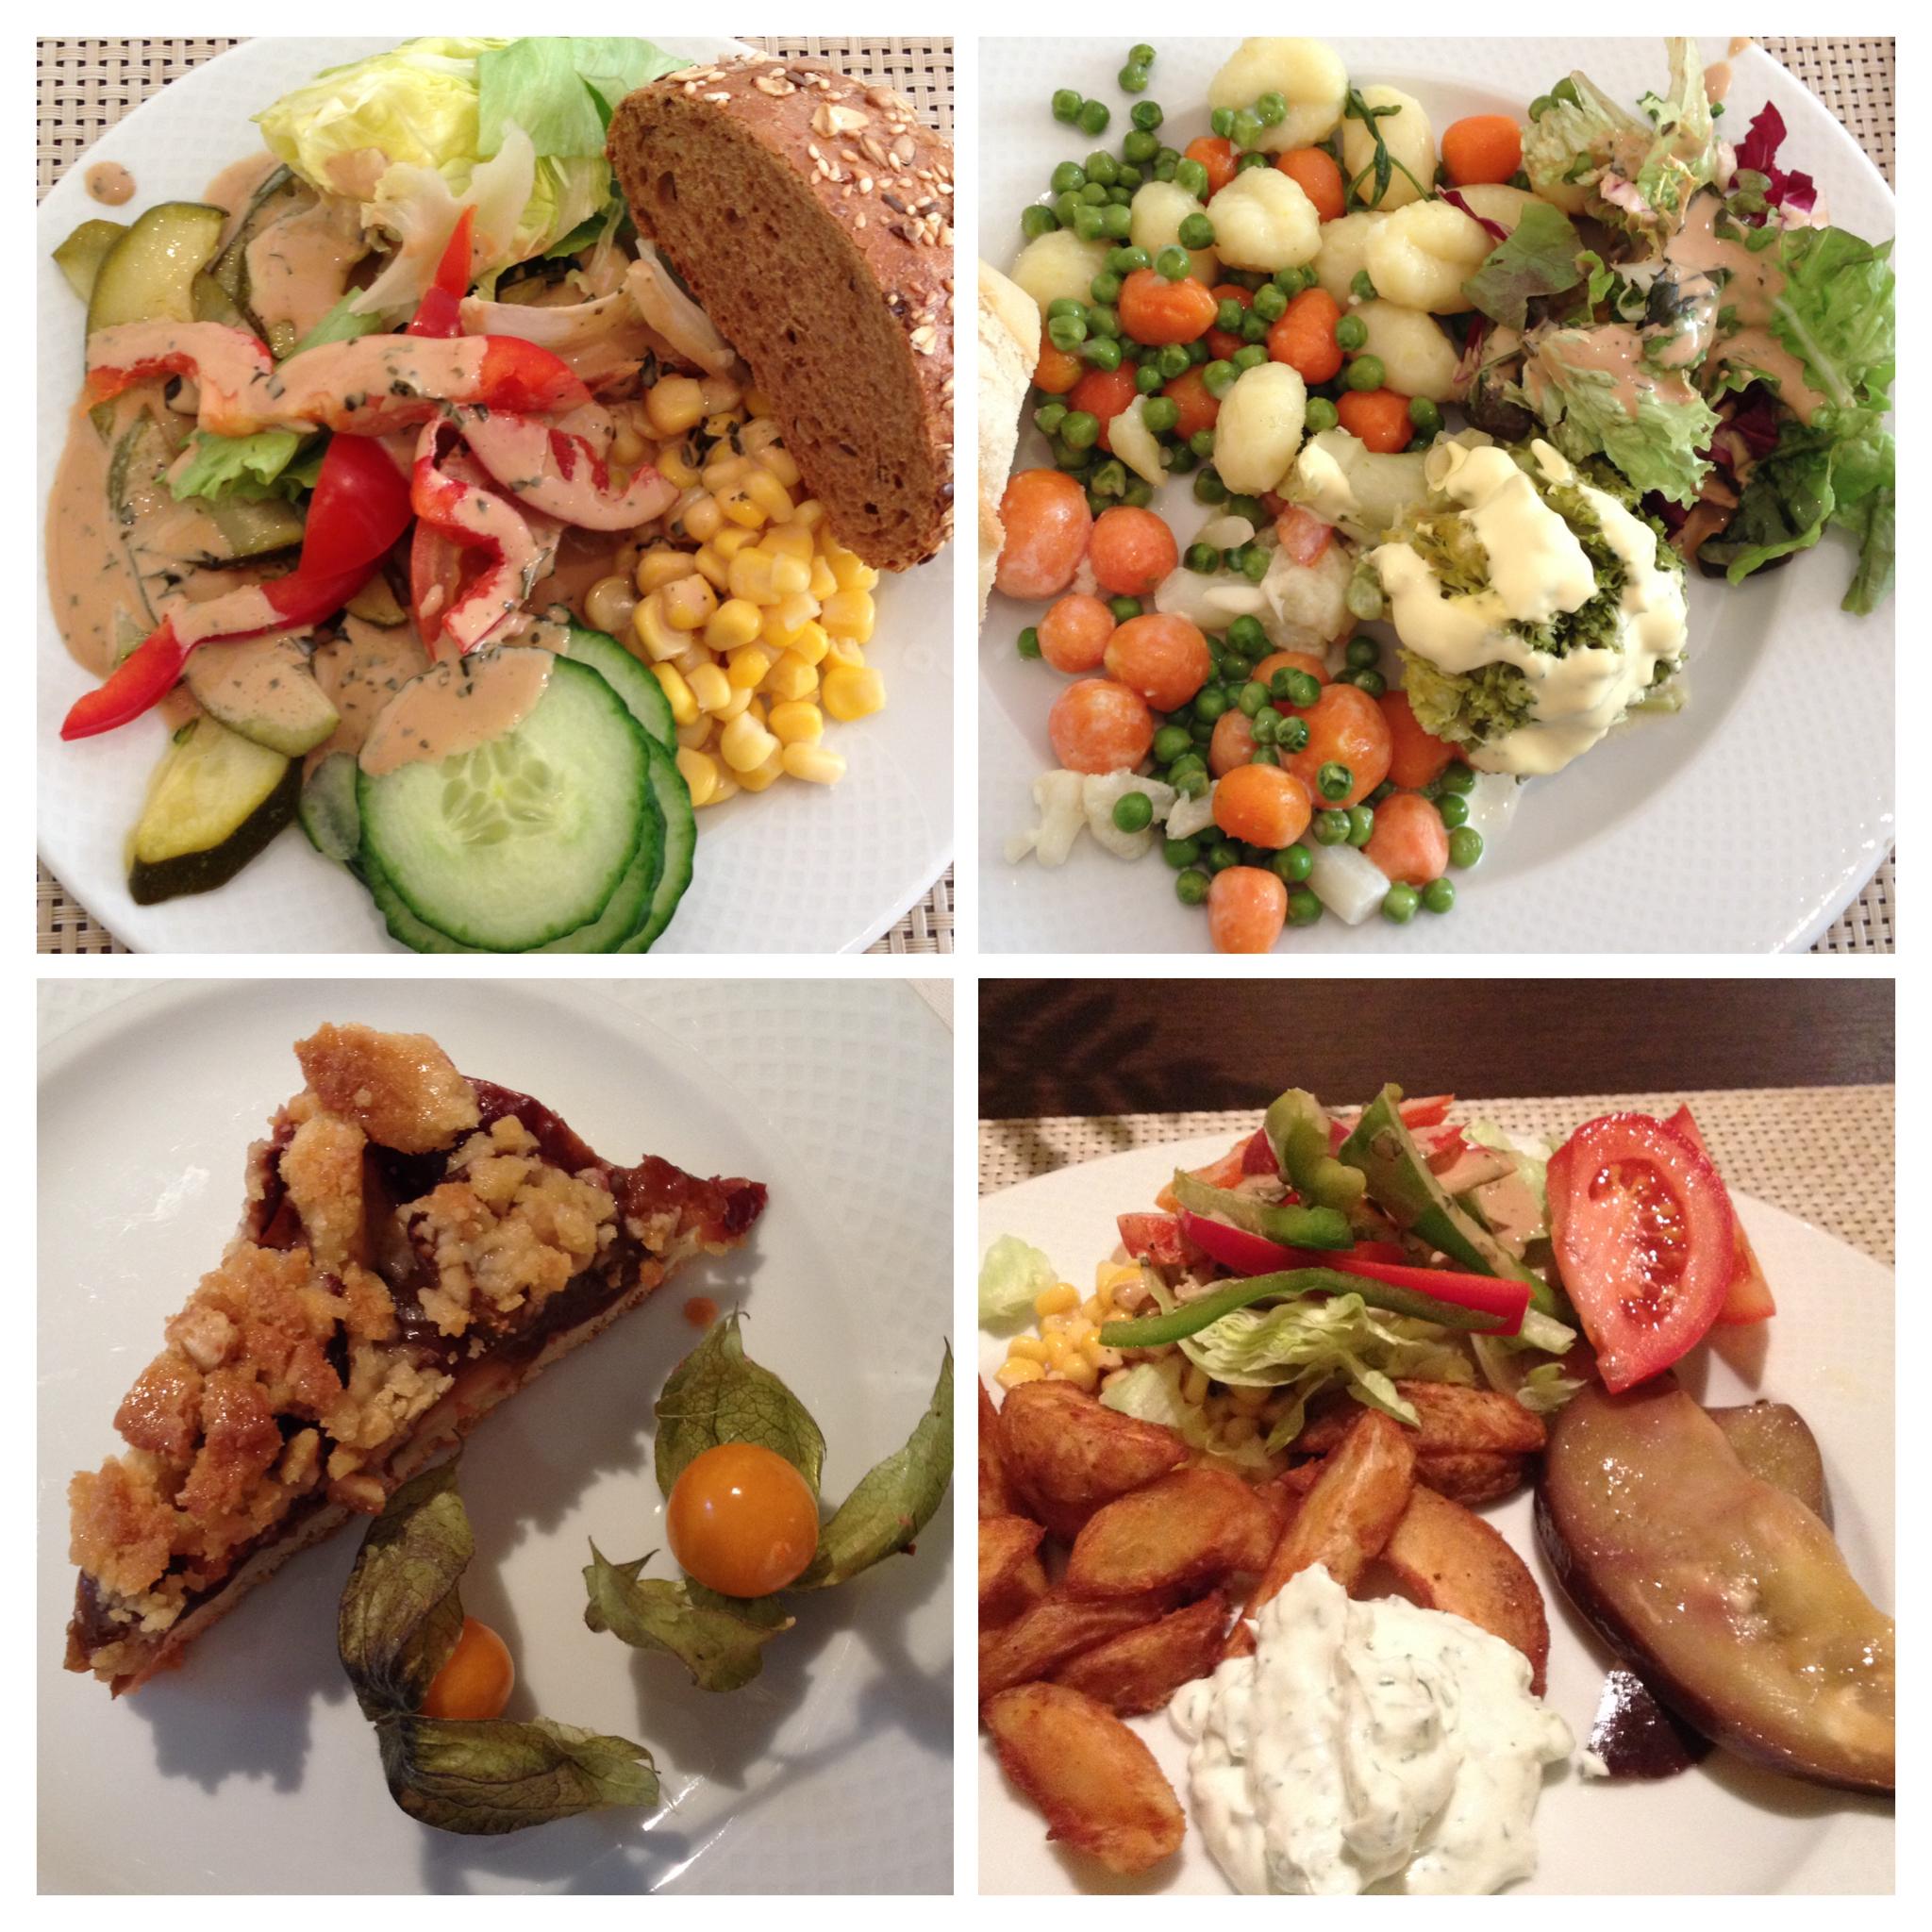 Essen aus dem Ramada in Bochum